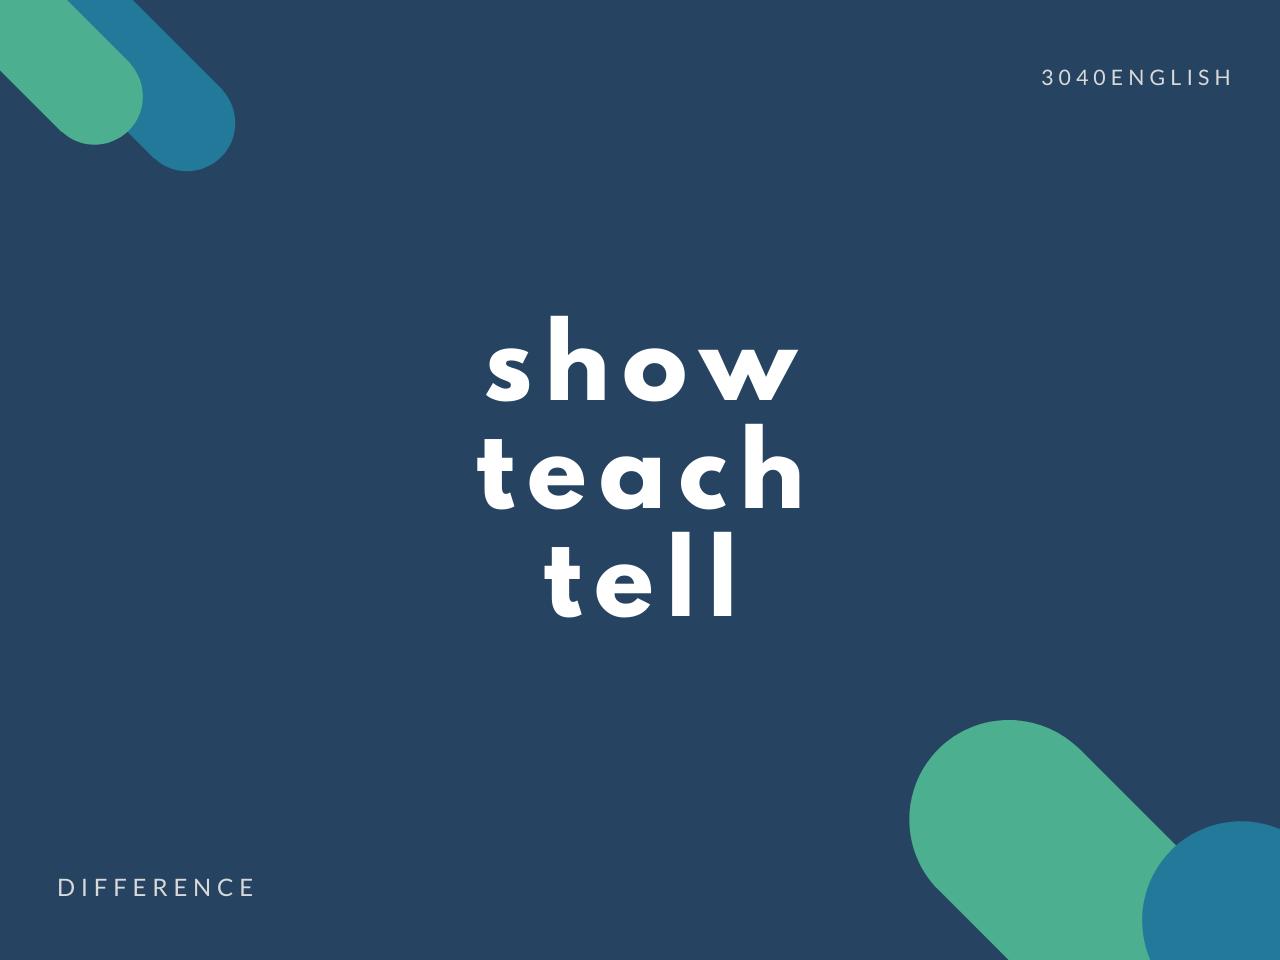 show・teach・tell の違いと簡単な使い方【例文あり】